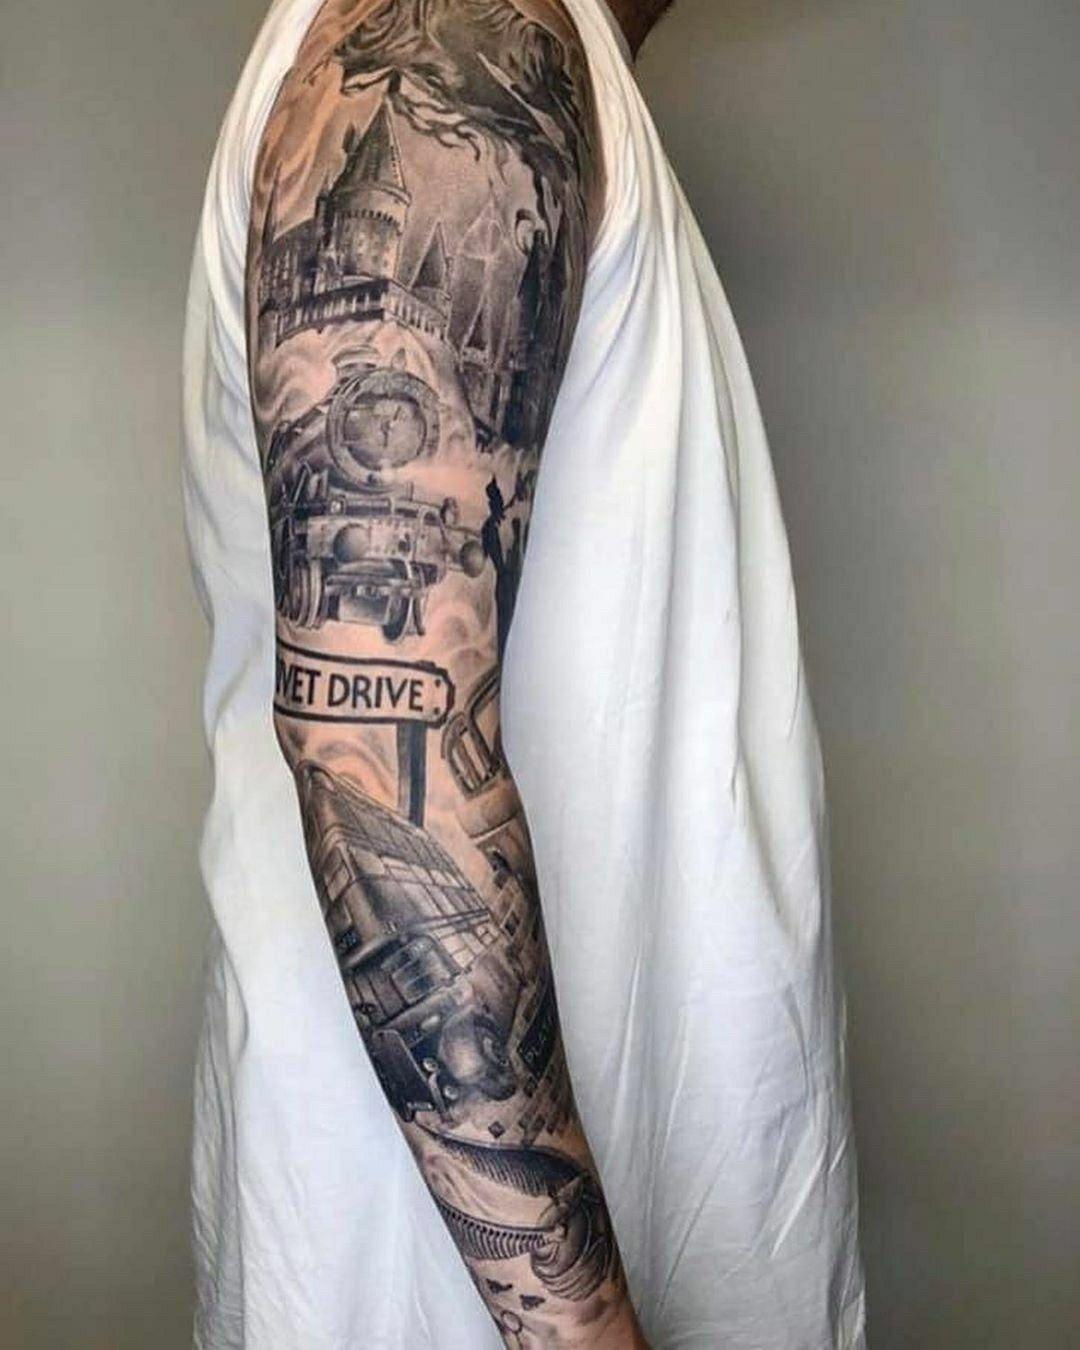 Pin By Haley Johnson On Art Tattoos Body Art Harry Potter Tattoo Sleeve Harry Potter Tattoos Hogwarts Tattoo